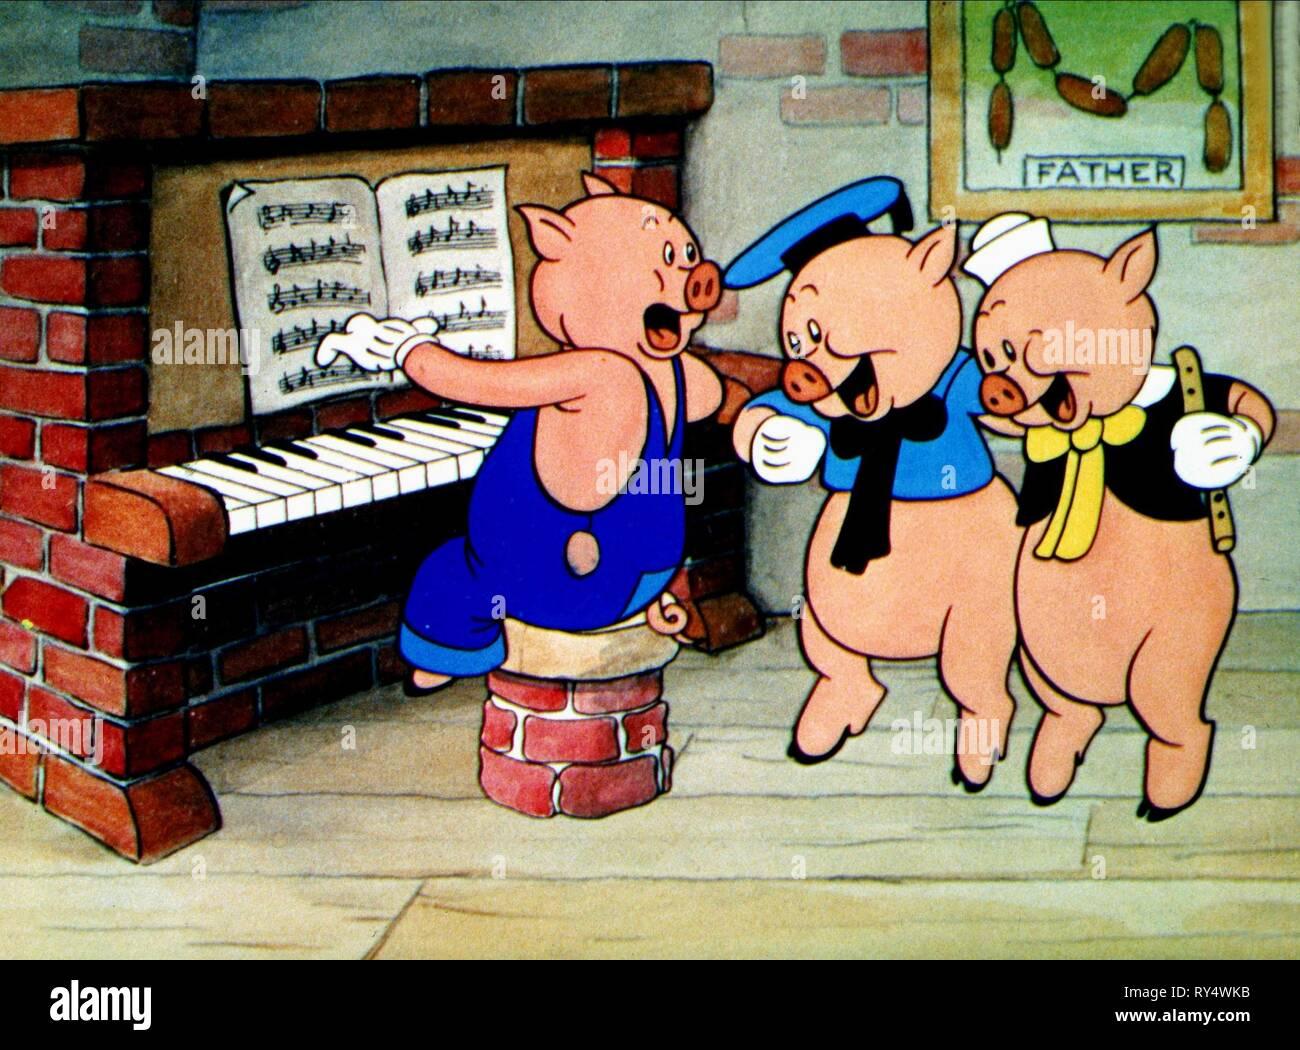 THE THREE LITTLE PIGS, WALT DISNEY'S TIMELESS TALES : THREE LITTLE PIGS, 2005 - Stock Image